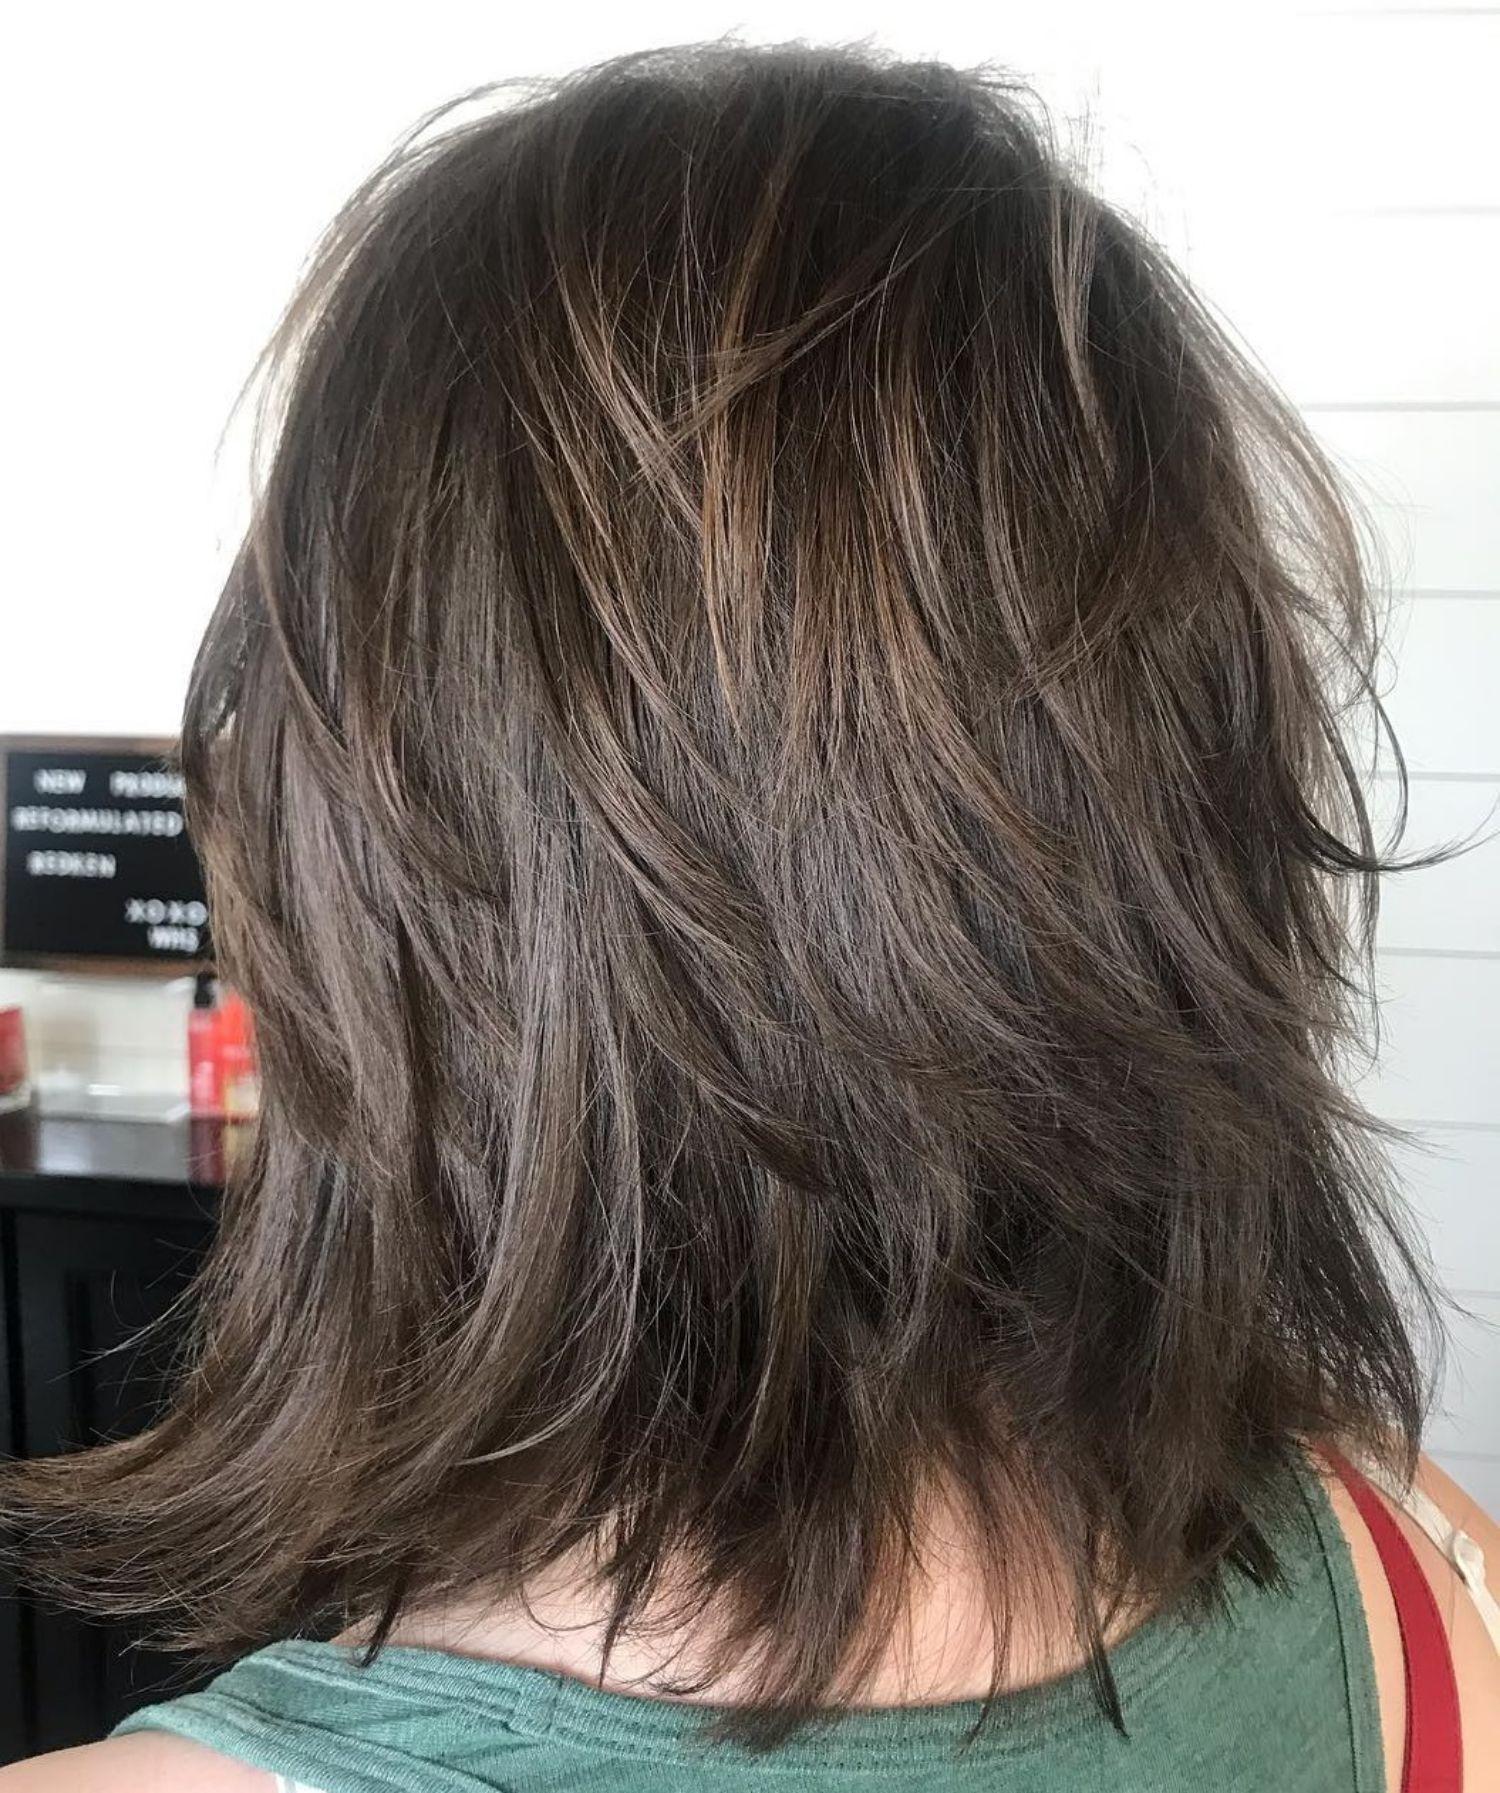 70 Best Variations Of A Medium Shag Haircut For Your Distinctive Style Modern Shag Haircut Medium Shag Haircuts Shag Haircut